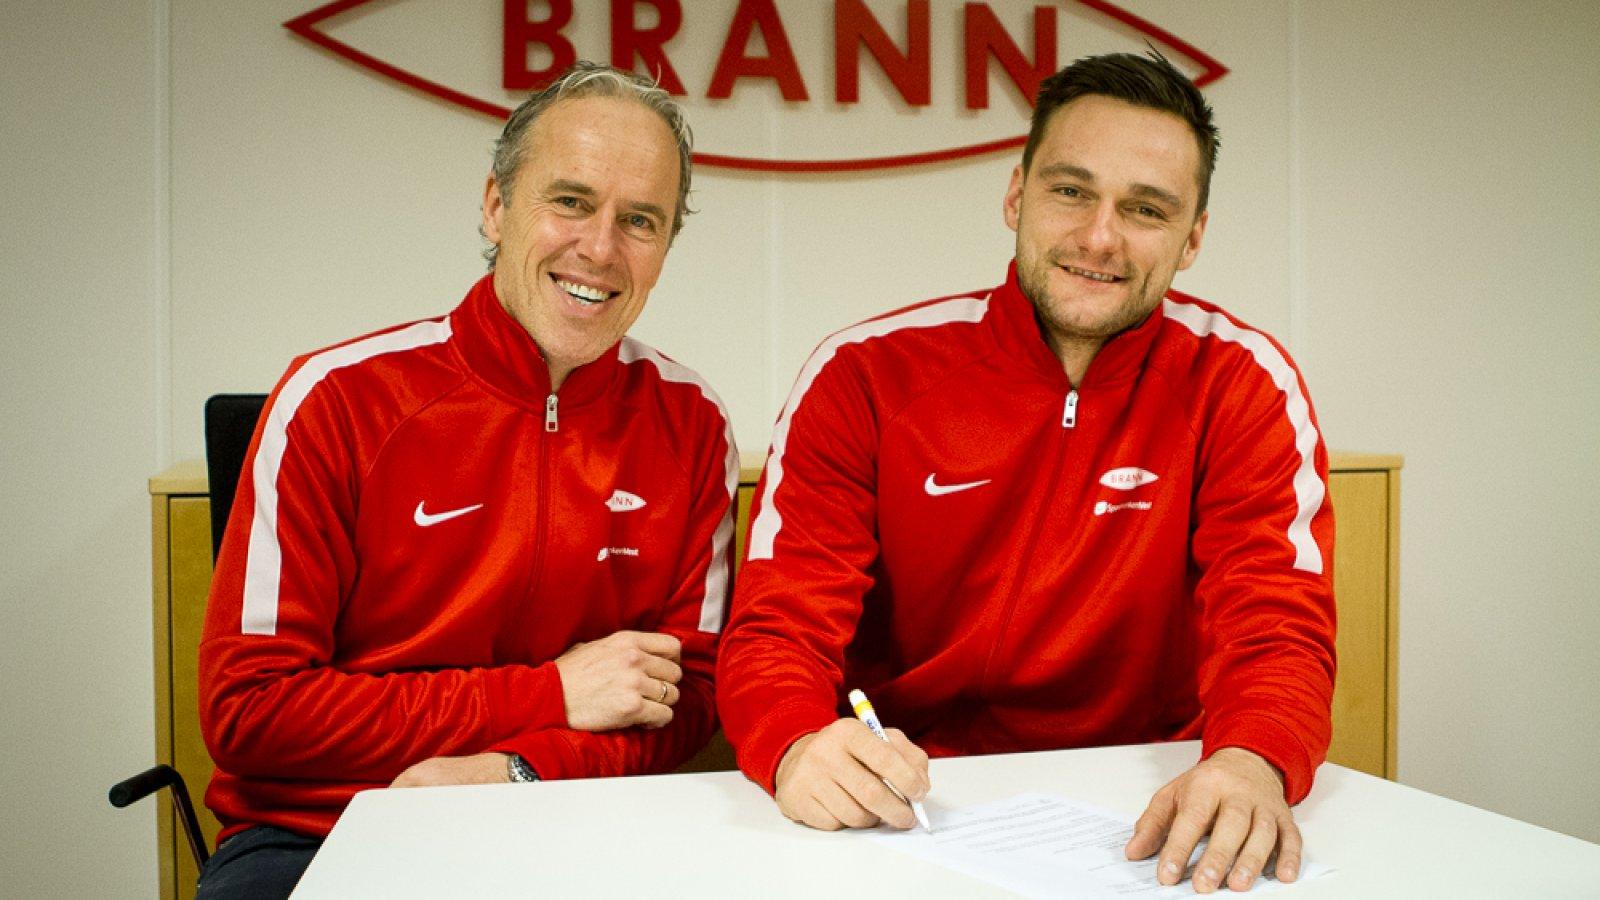 NY KONTRAKT: Piotr Leciejewski skriver under ny kontrakt som varer ut 2019. Her sammen med sportssjef Rune Soltvedt (t.v.).